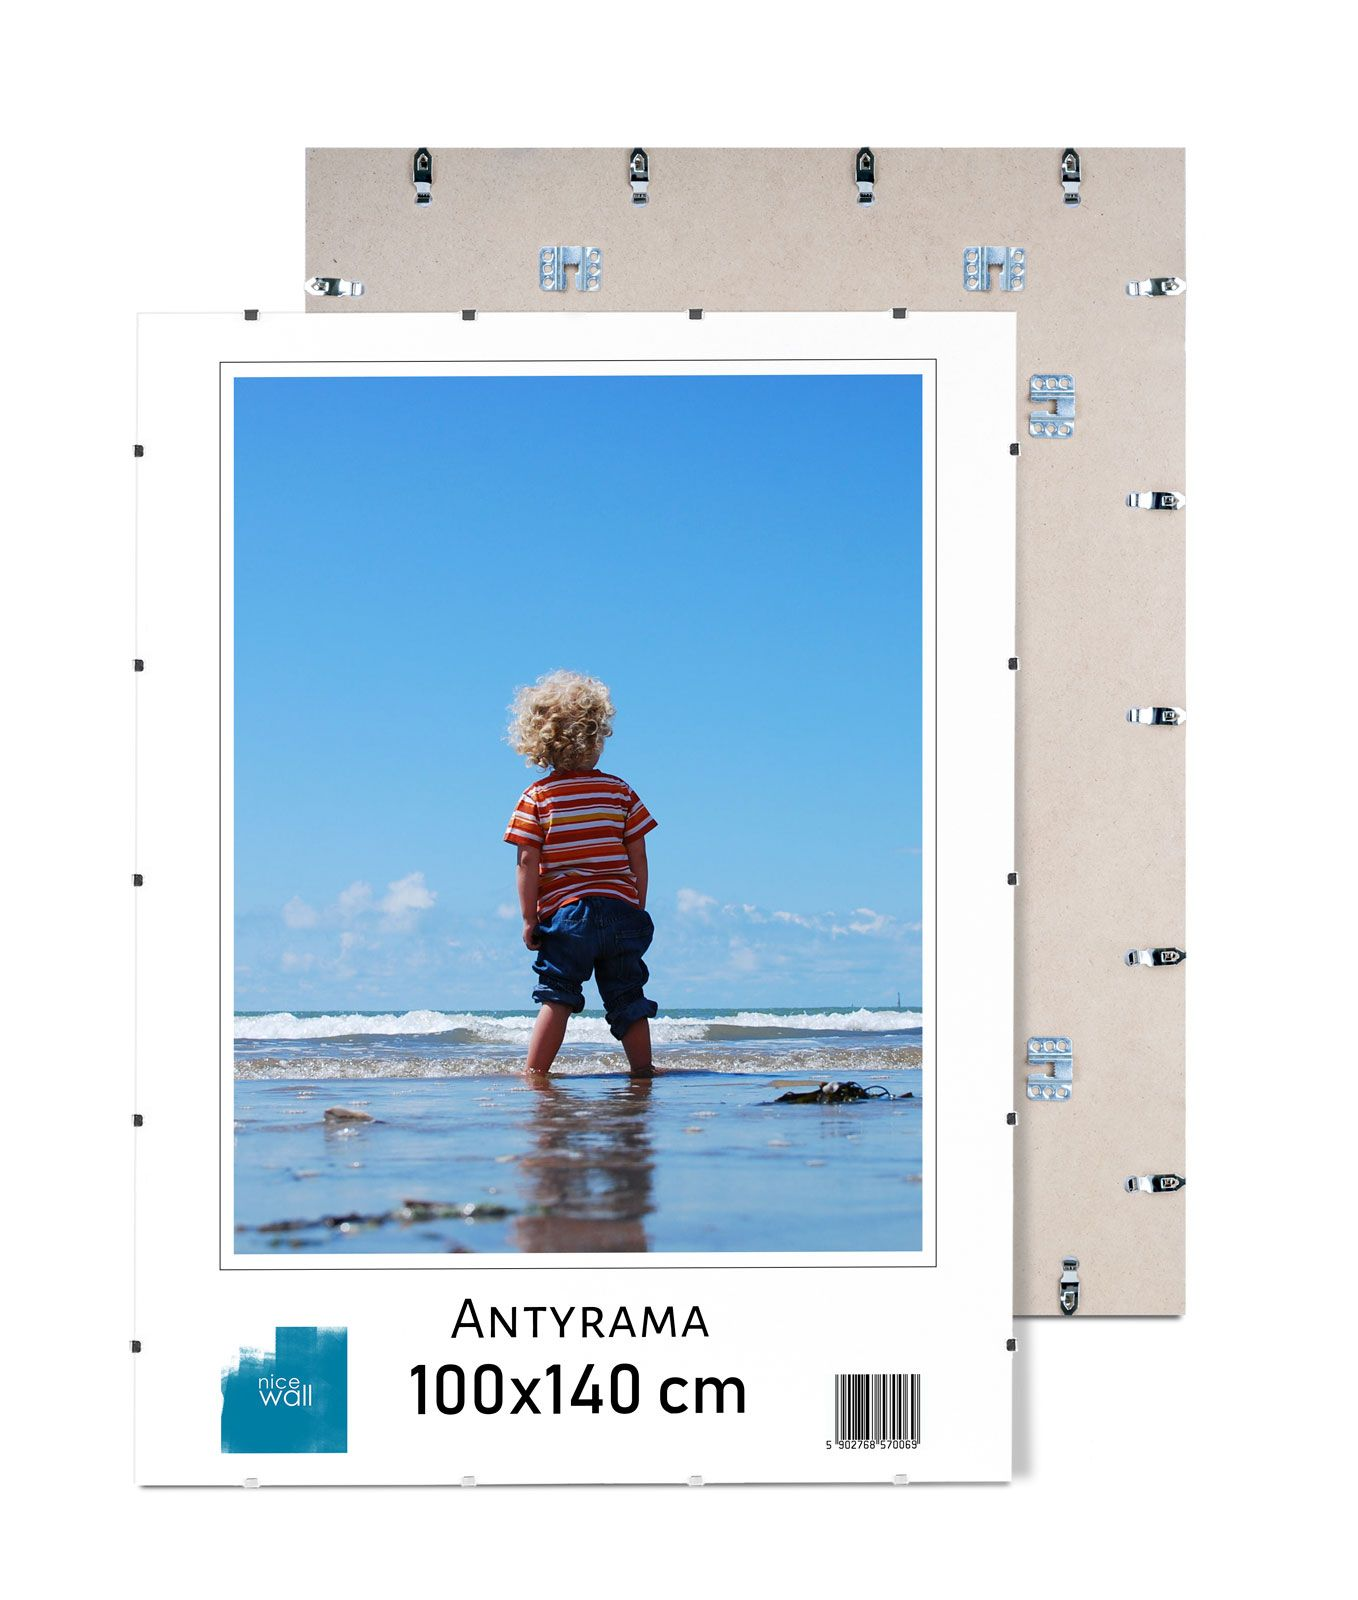 Antirama 140x100 cm AntiRAMI 100x140 cm Formát B0